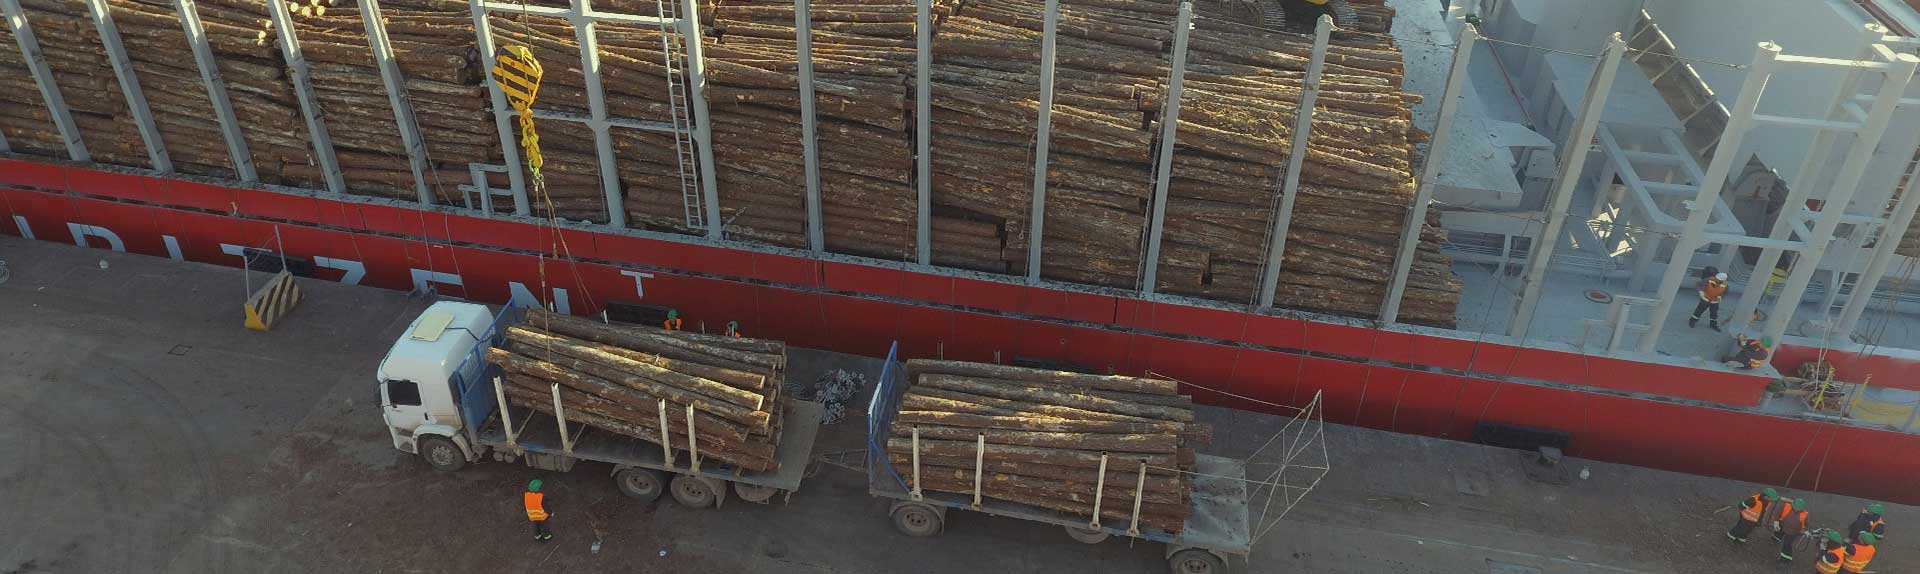 grúa cargando troncos